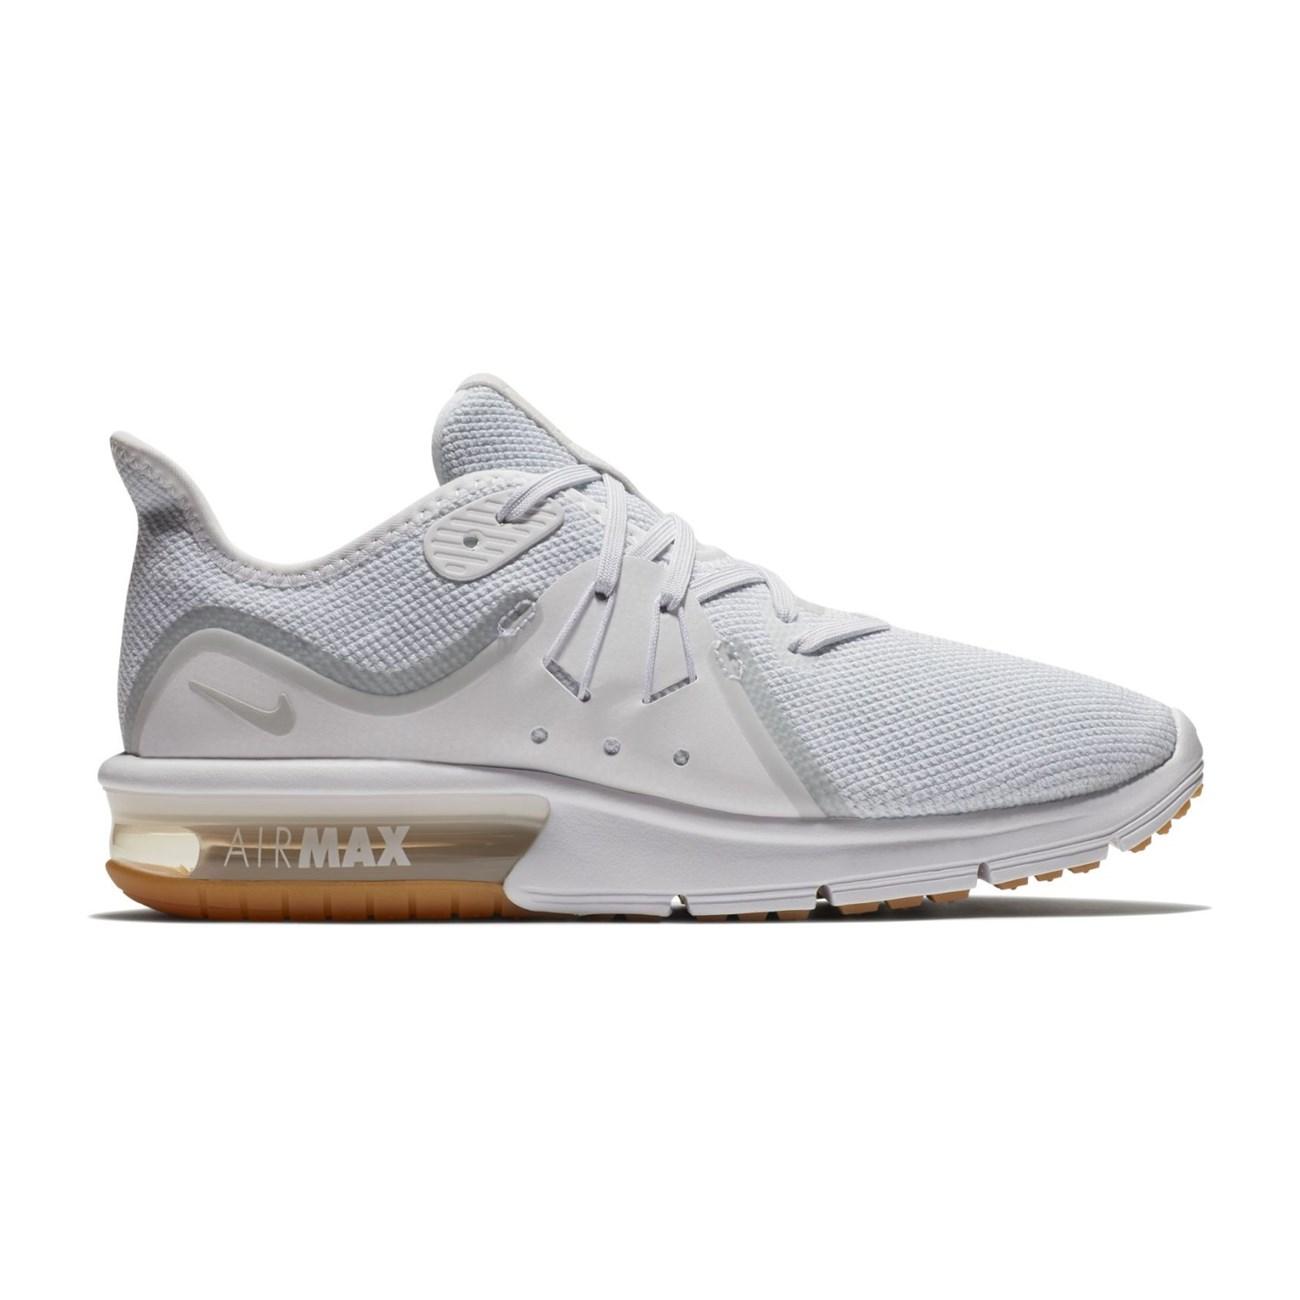 NIKE AIR MAX SEQUENT 3 W   Παπούτσια για Τρέξιμο  27187221011